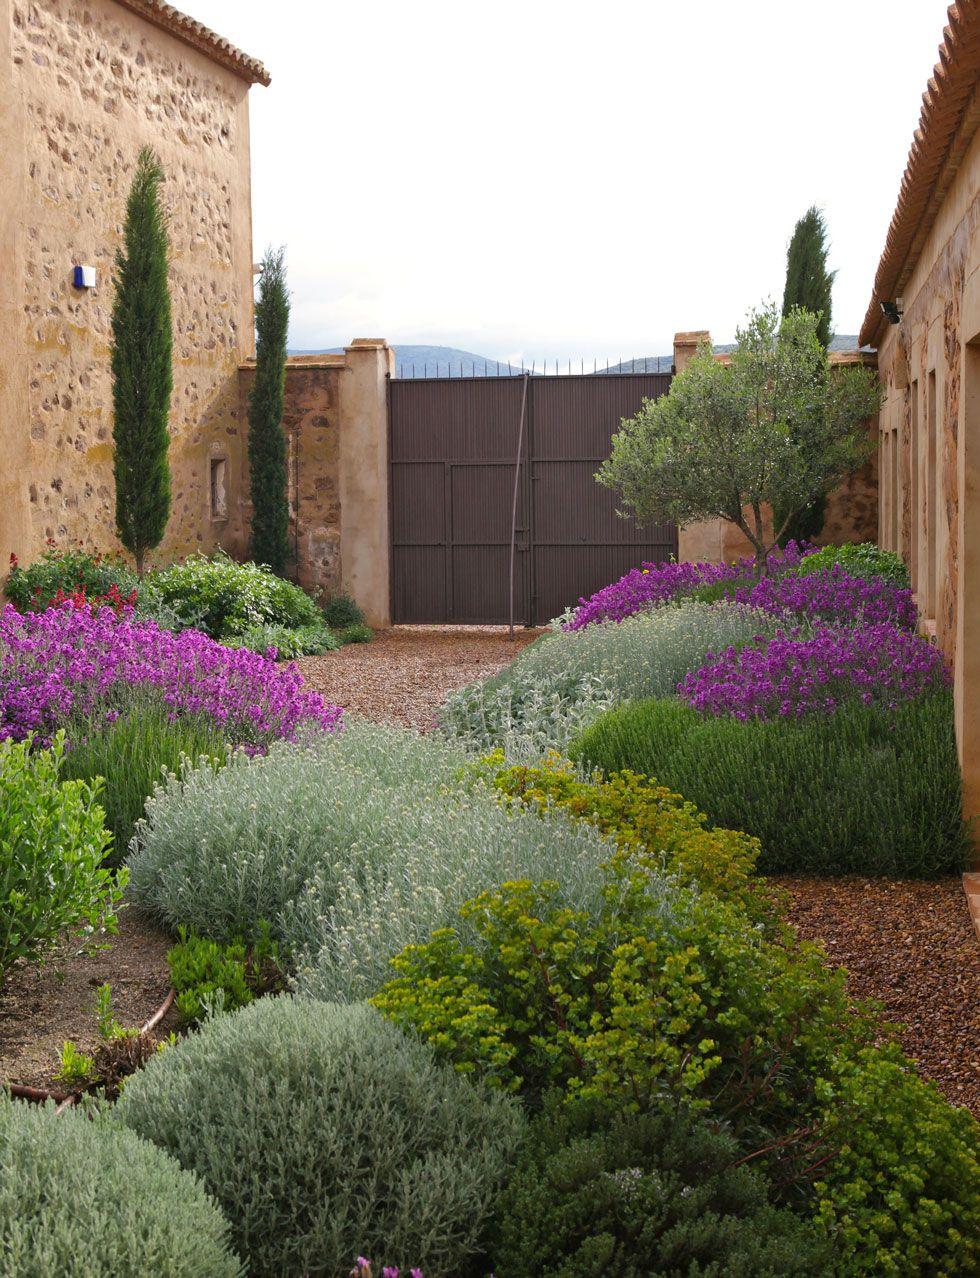 Giardino rustico guida 25 idee per un giardino ricco for Idee giardino moderno